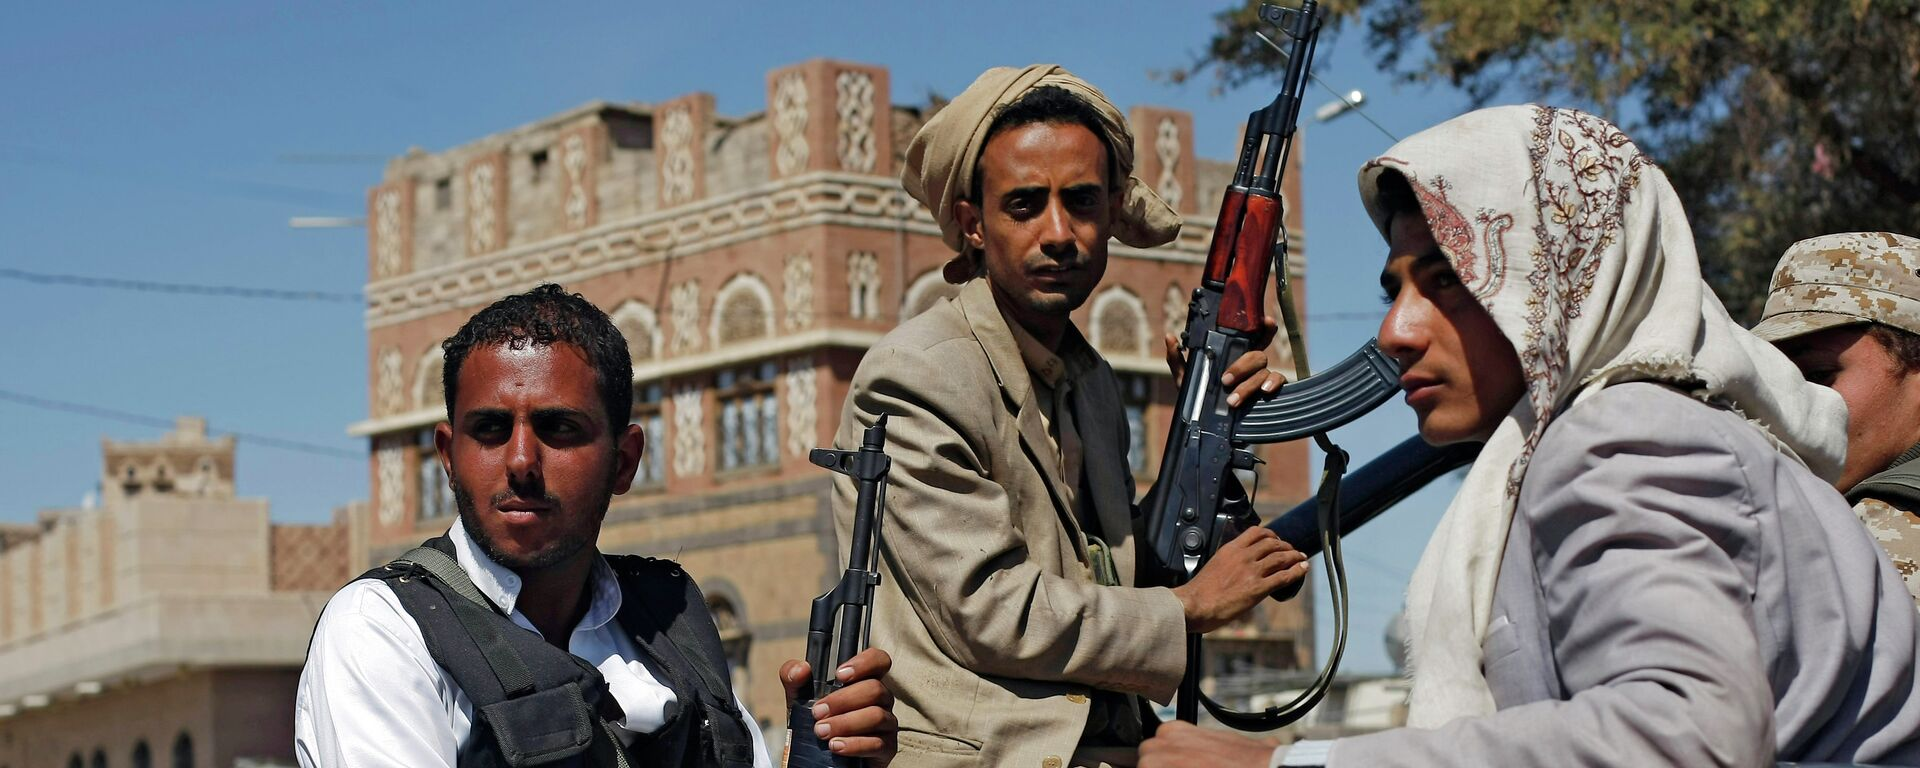 Hutíes en Saná, Yemen - Sputnik Mundo, 1920, 17.02.2021